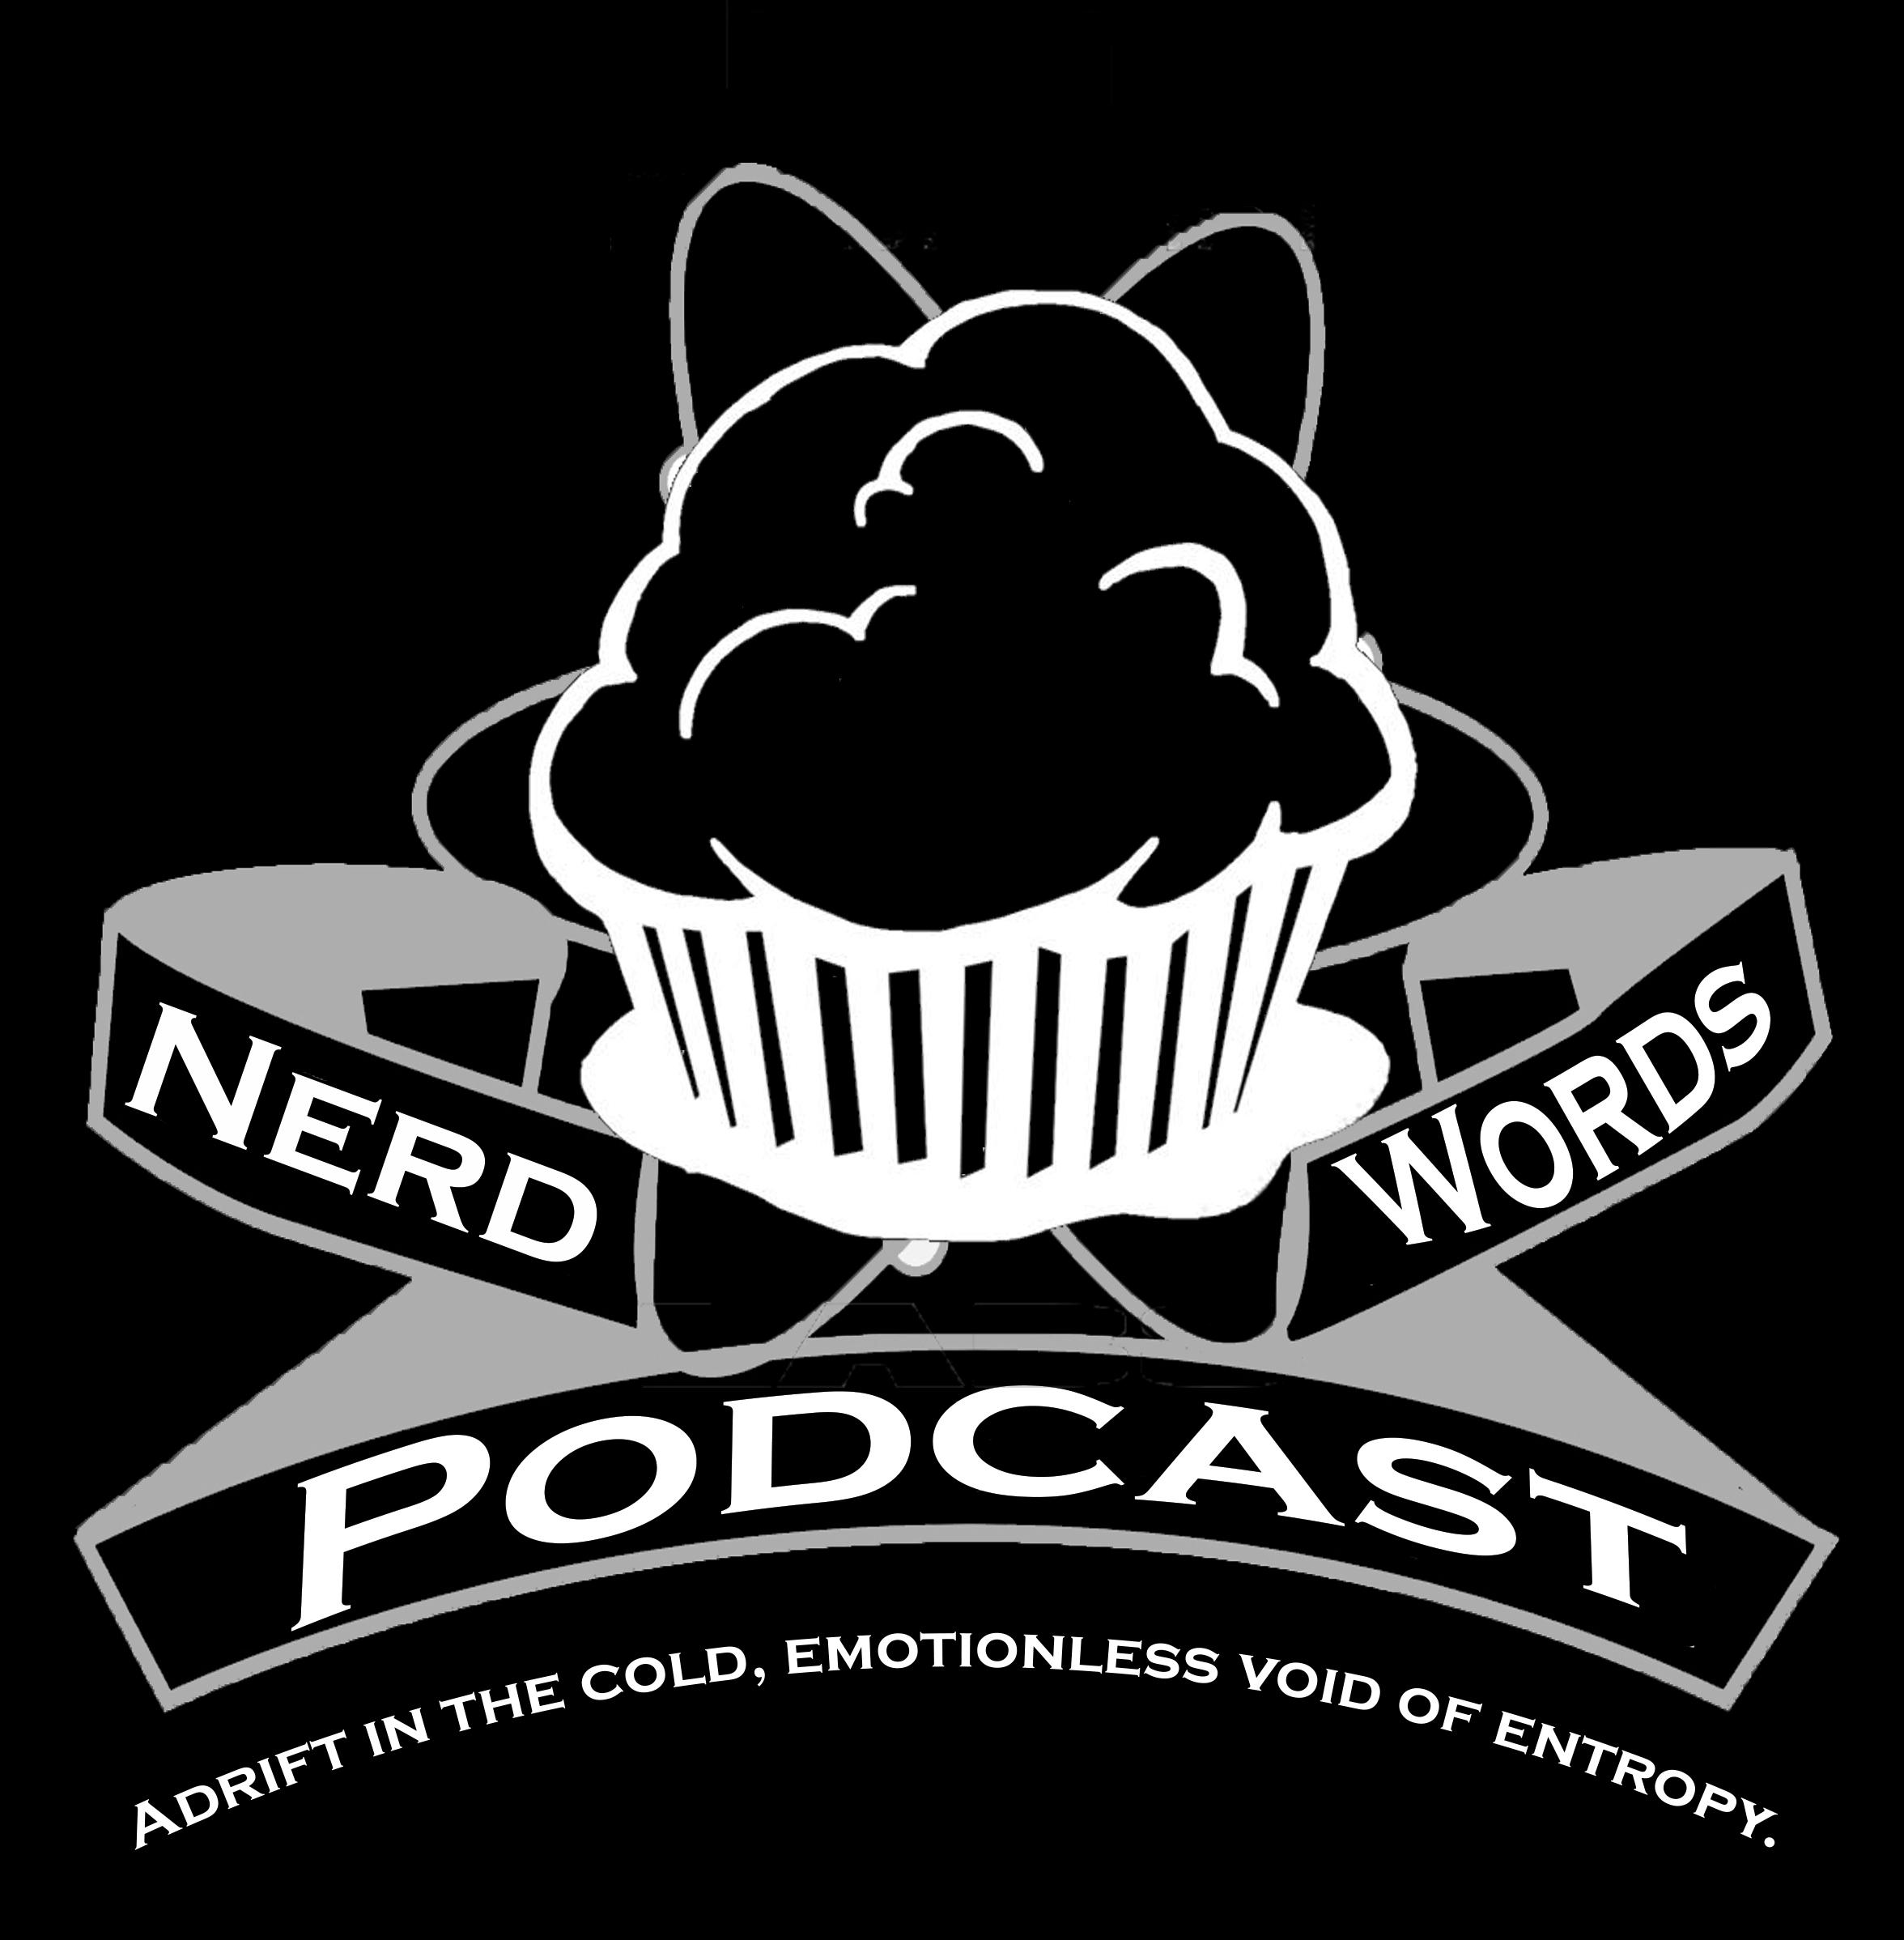 nerd Words atomic.jpg